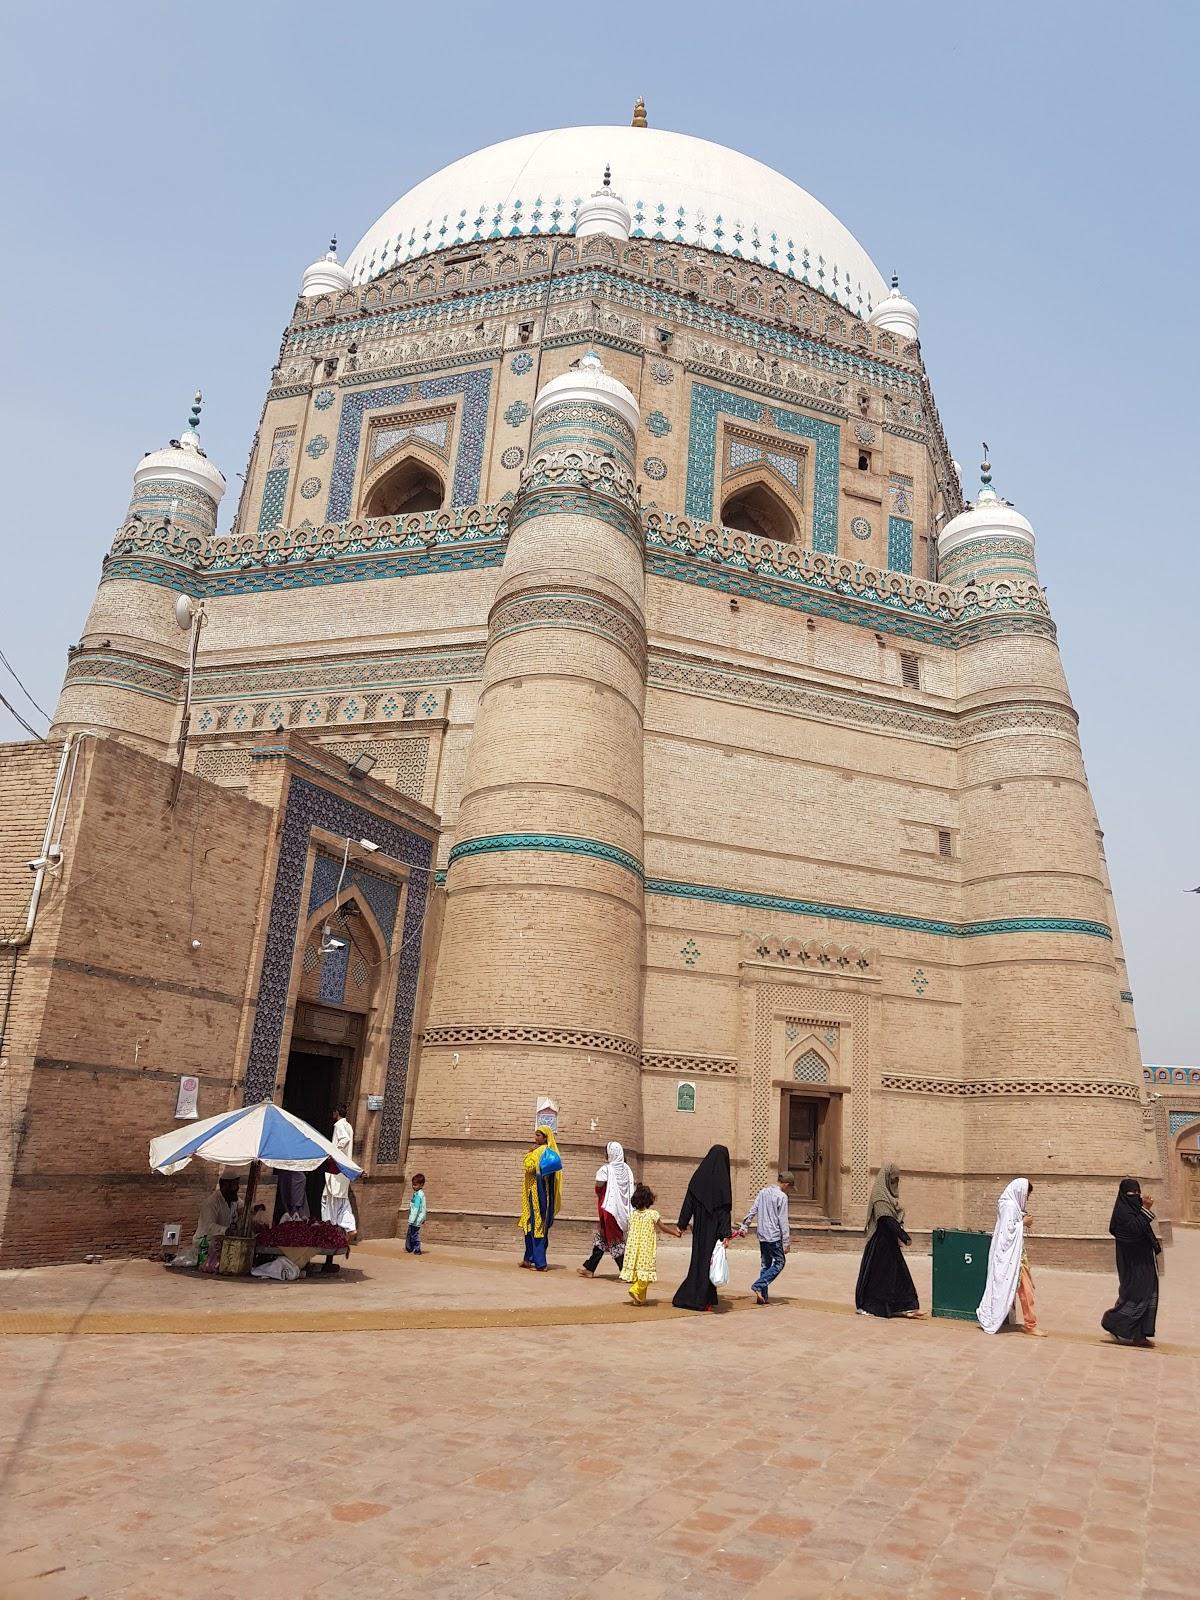 Visit Darbar of Hazrat Shah Rukn-E-Alam on your trip to Multan